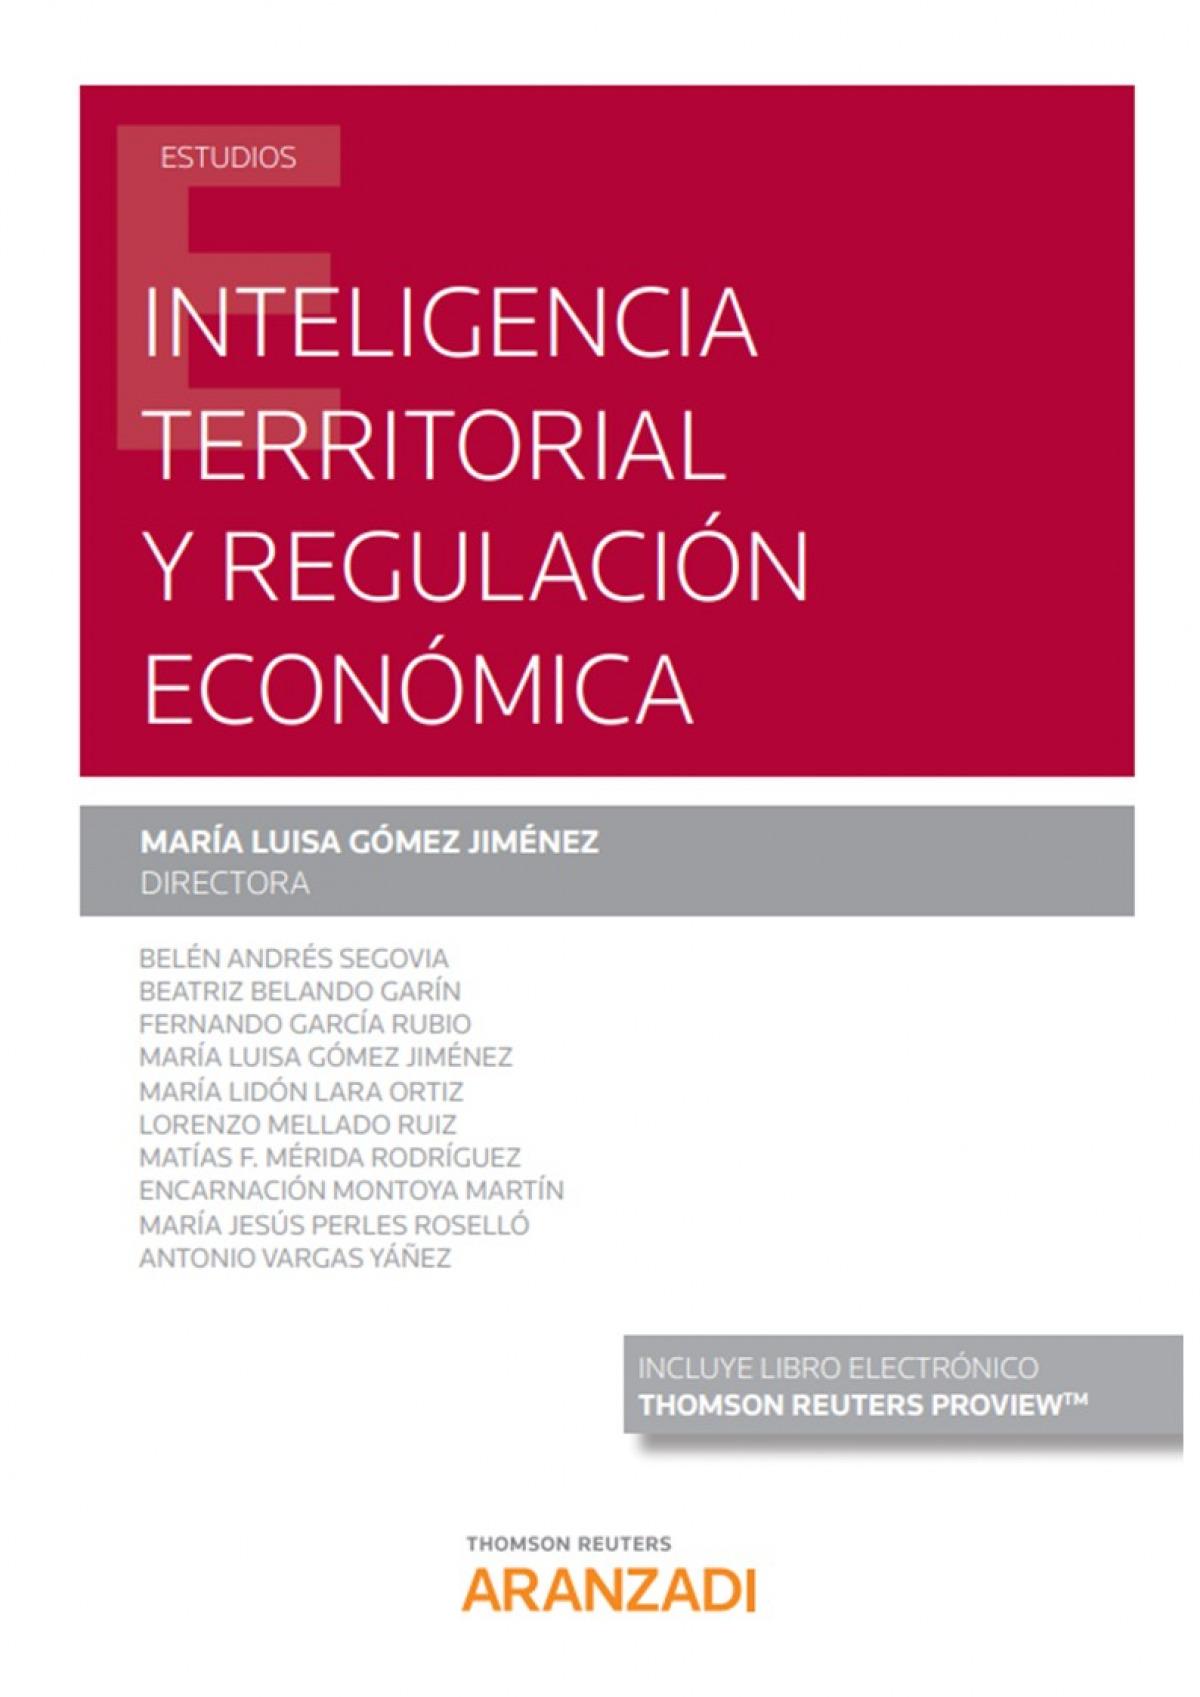 Inteligencia Territorial y Regulación Económica (Papel + e-book)